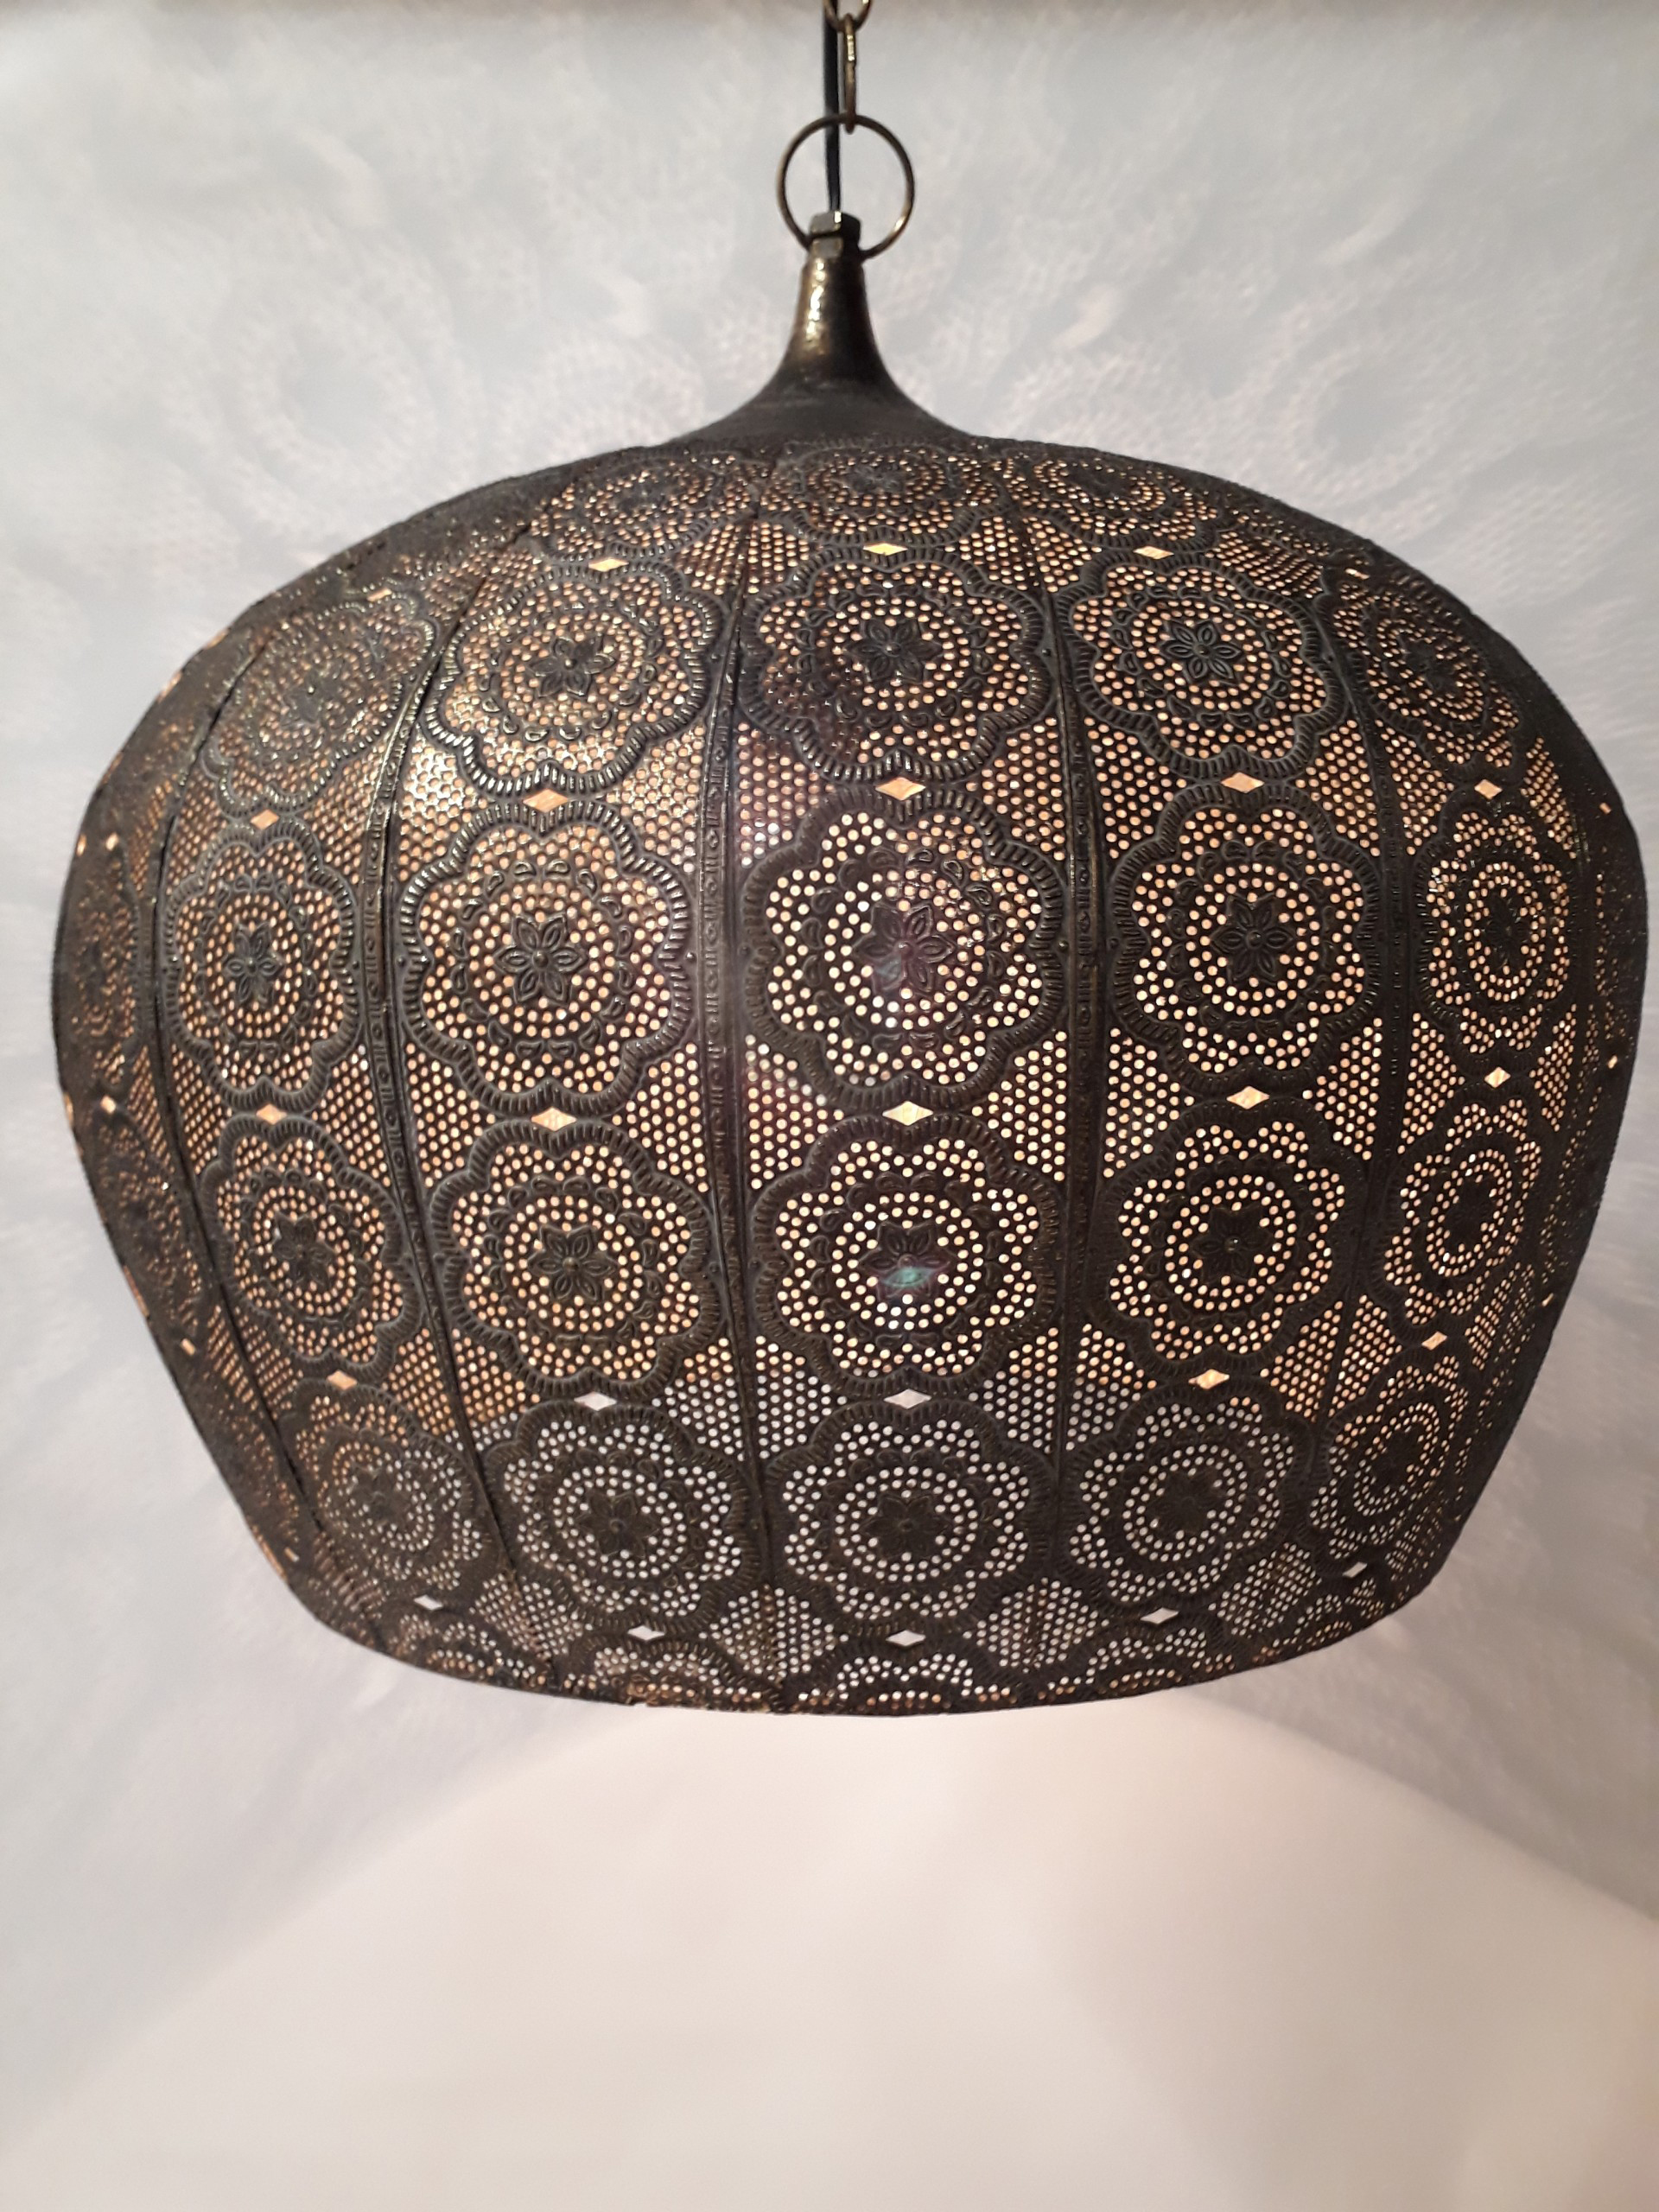 h ngelampe marokko oriental metall beleuchtung h ngelampen freudenhaus designkaufhaus. Black Bedroom Furniture Sets. Home Design Ideas